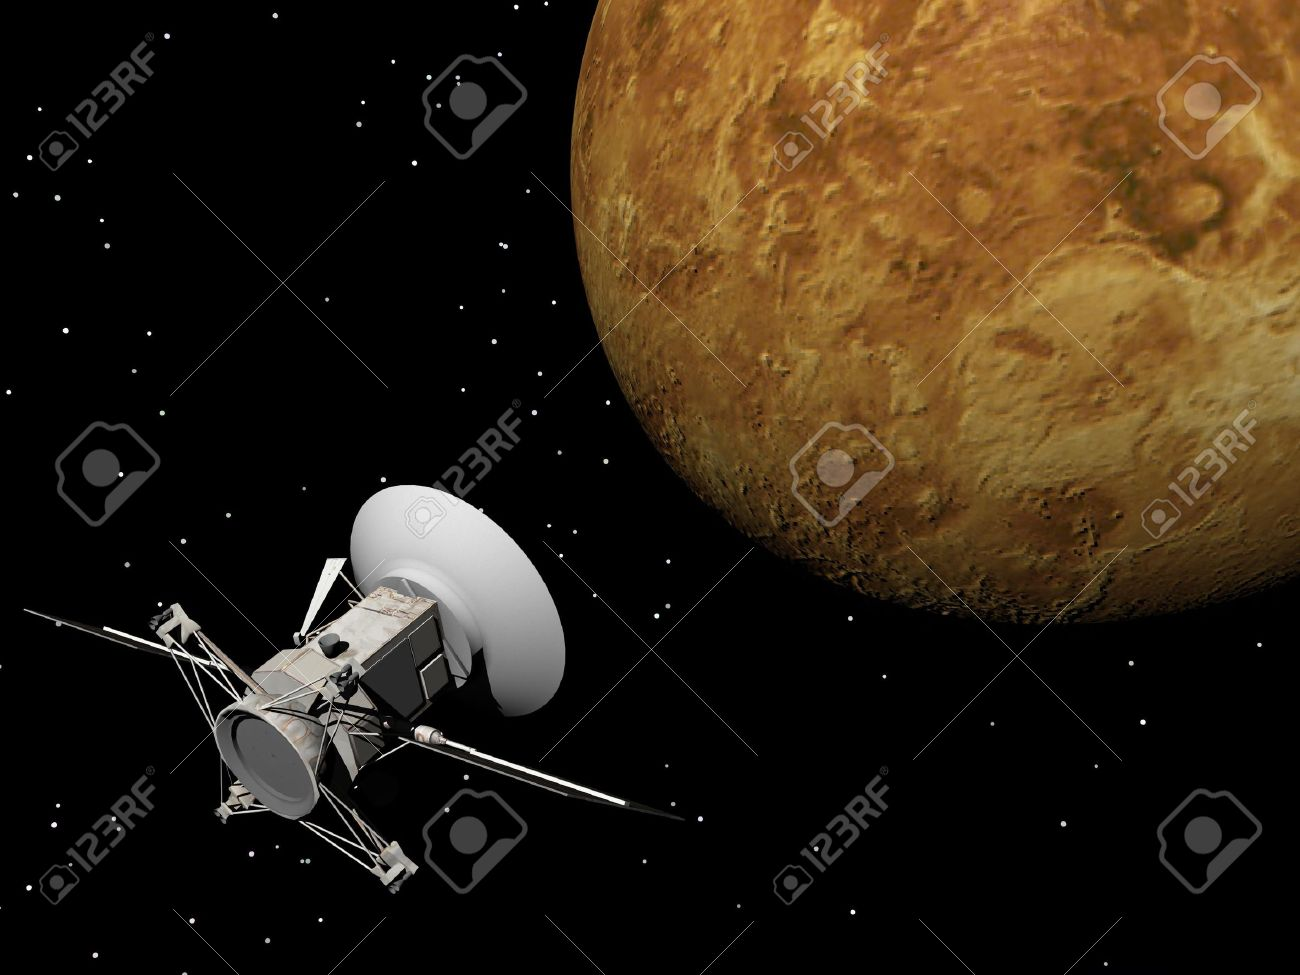 Magellan spacecraft near Venus planet by night Stock Photo - 16801247